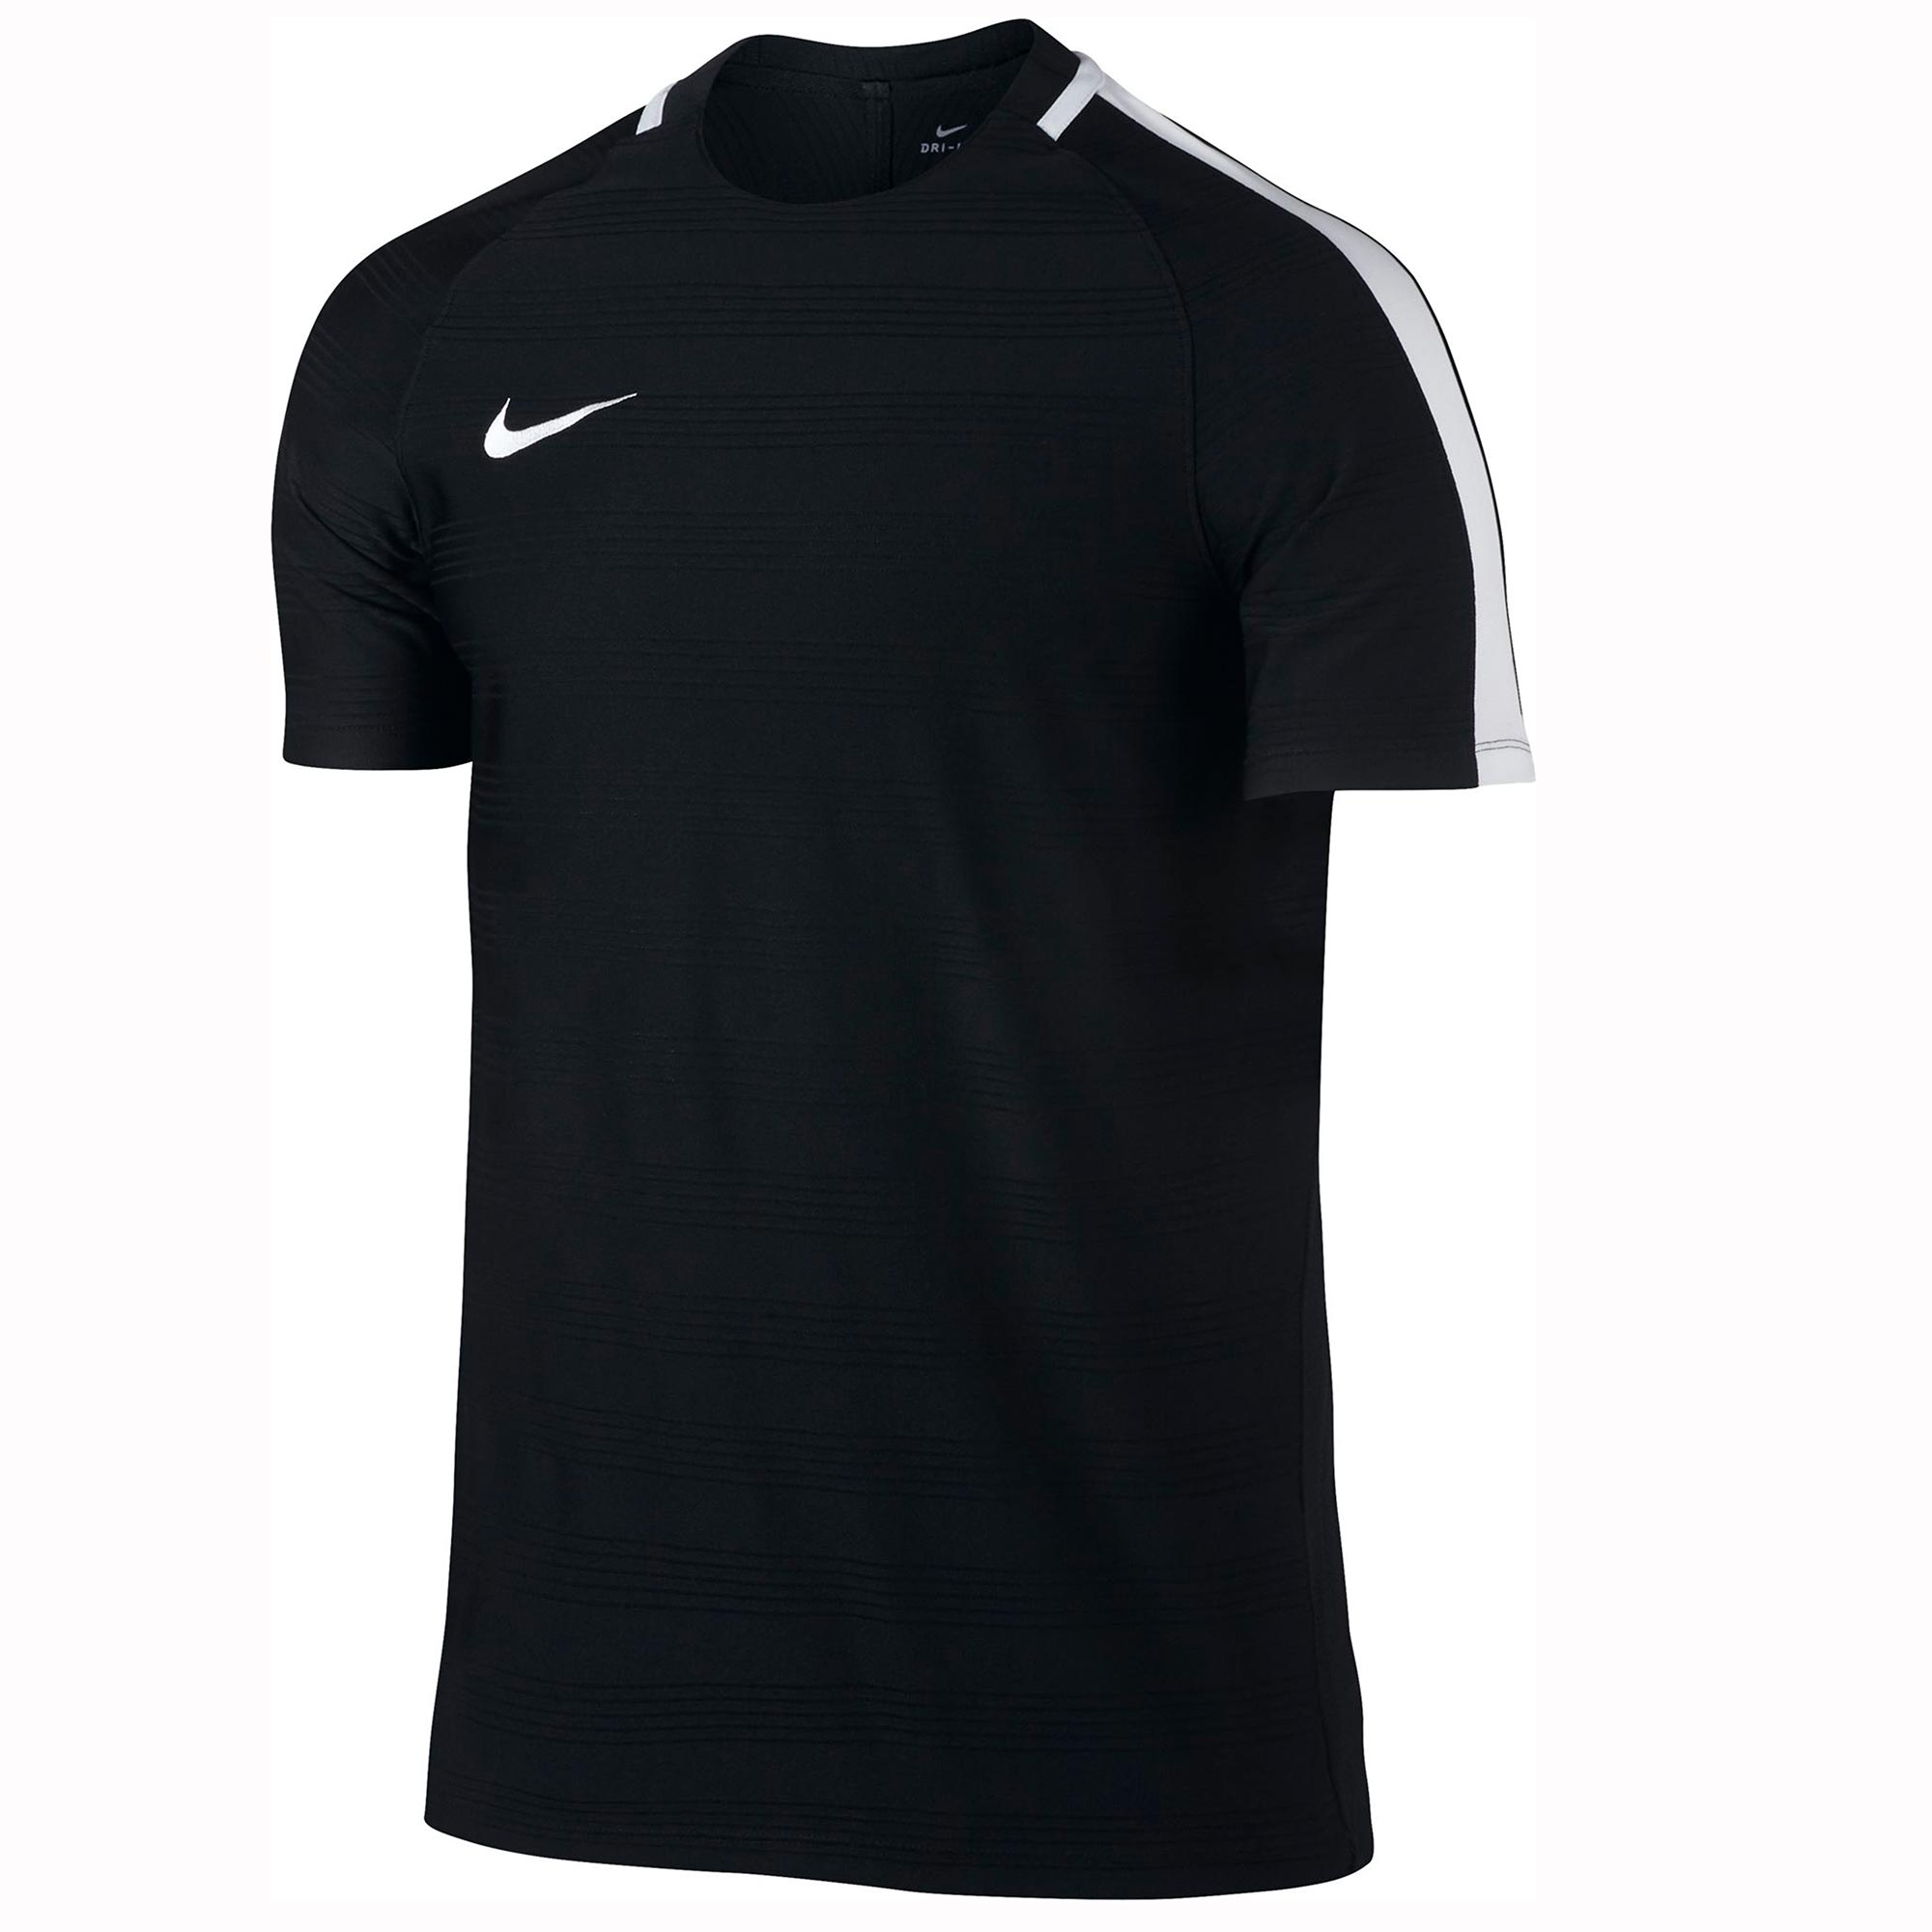 Nike Dry Squad Training Top - Black/White